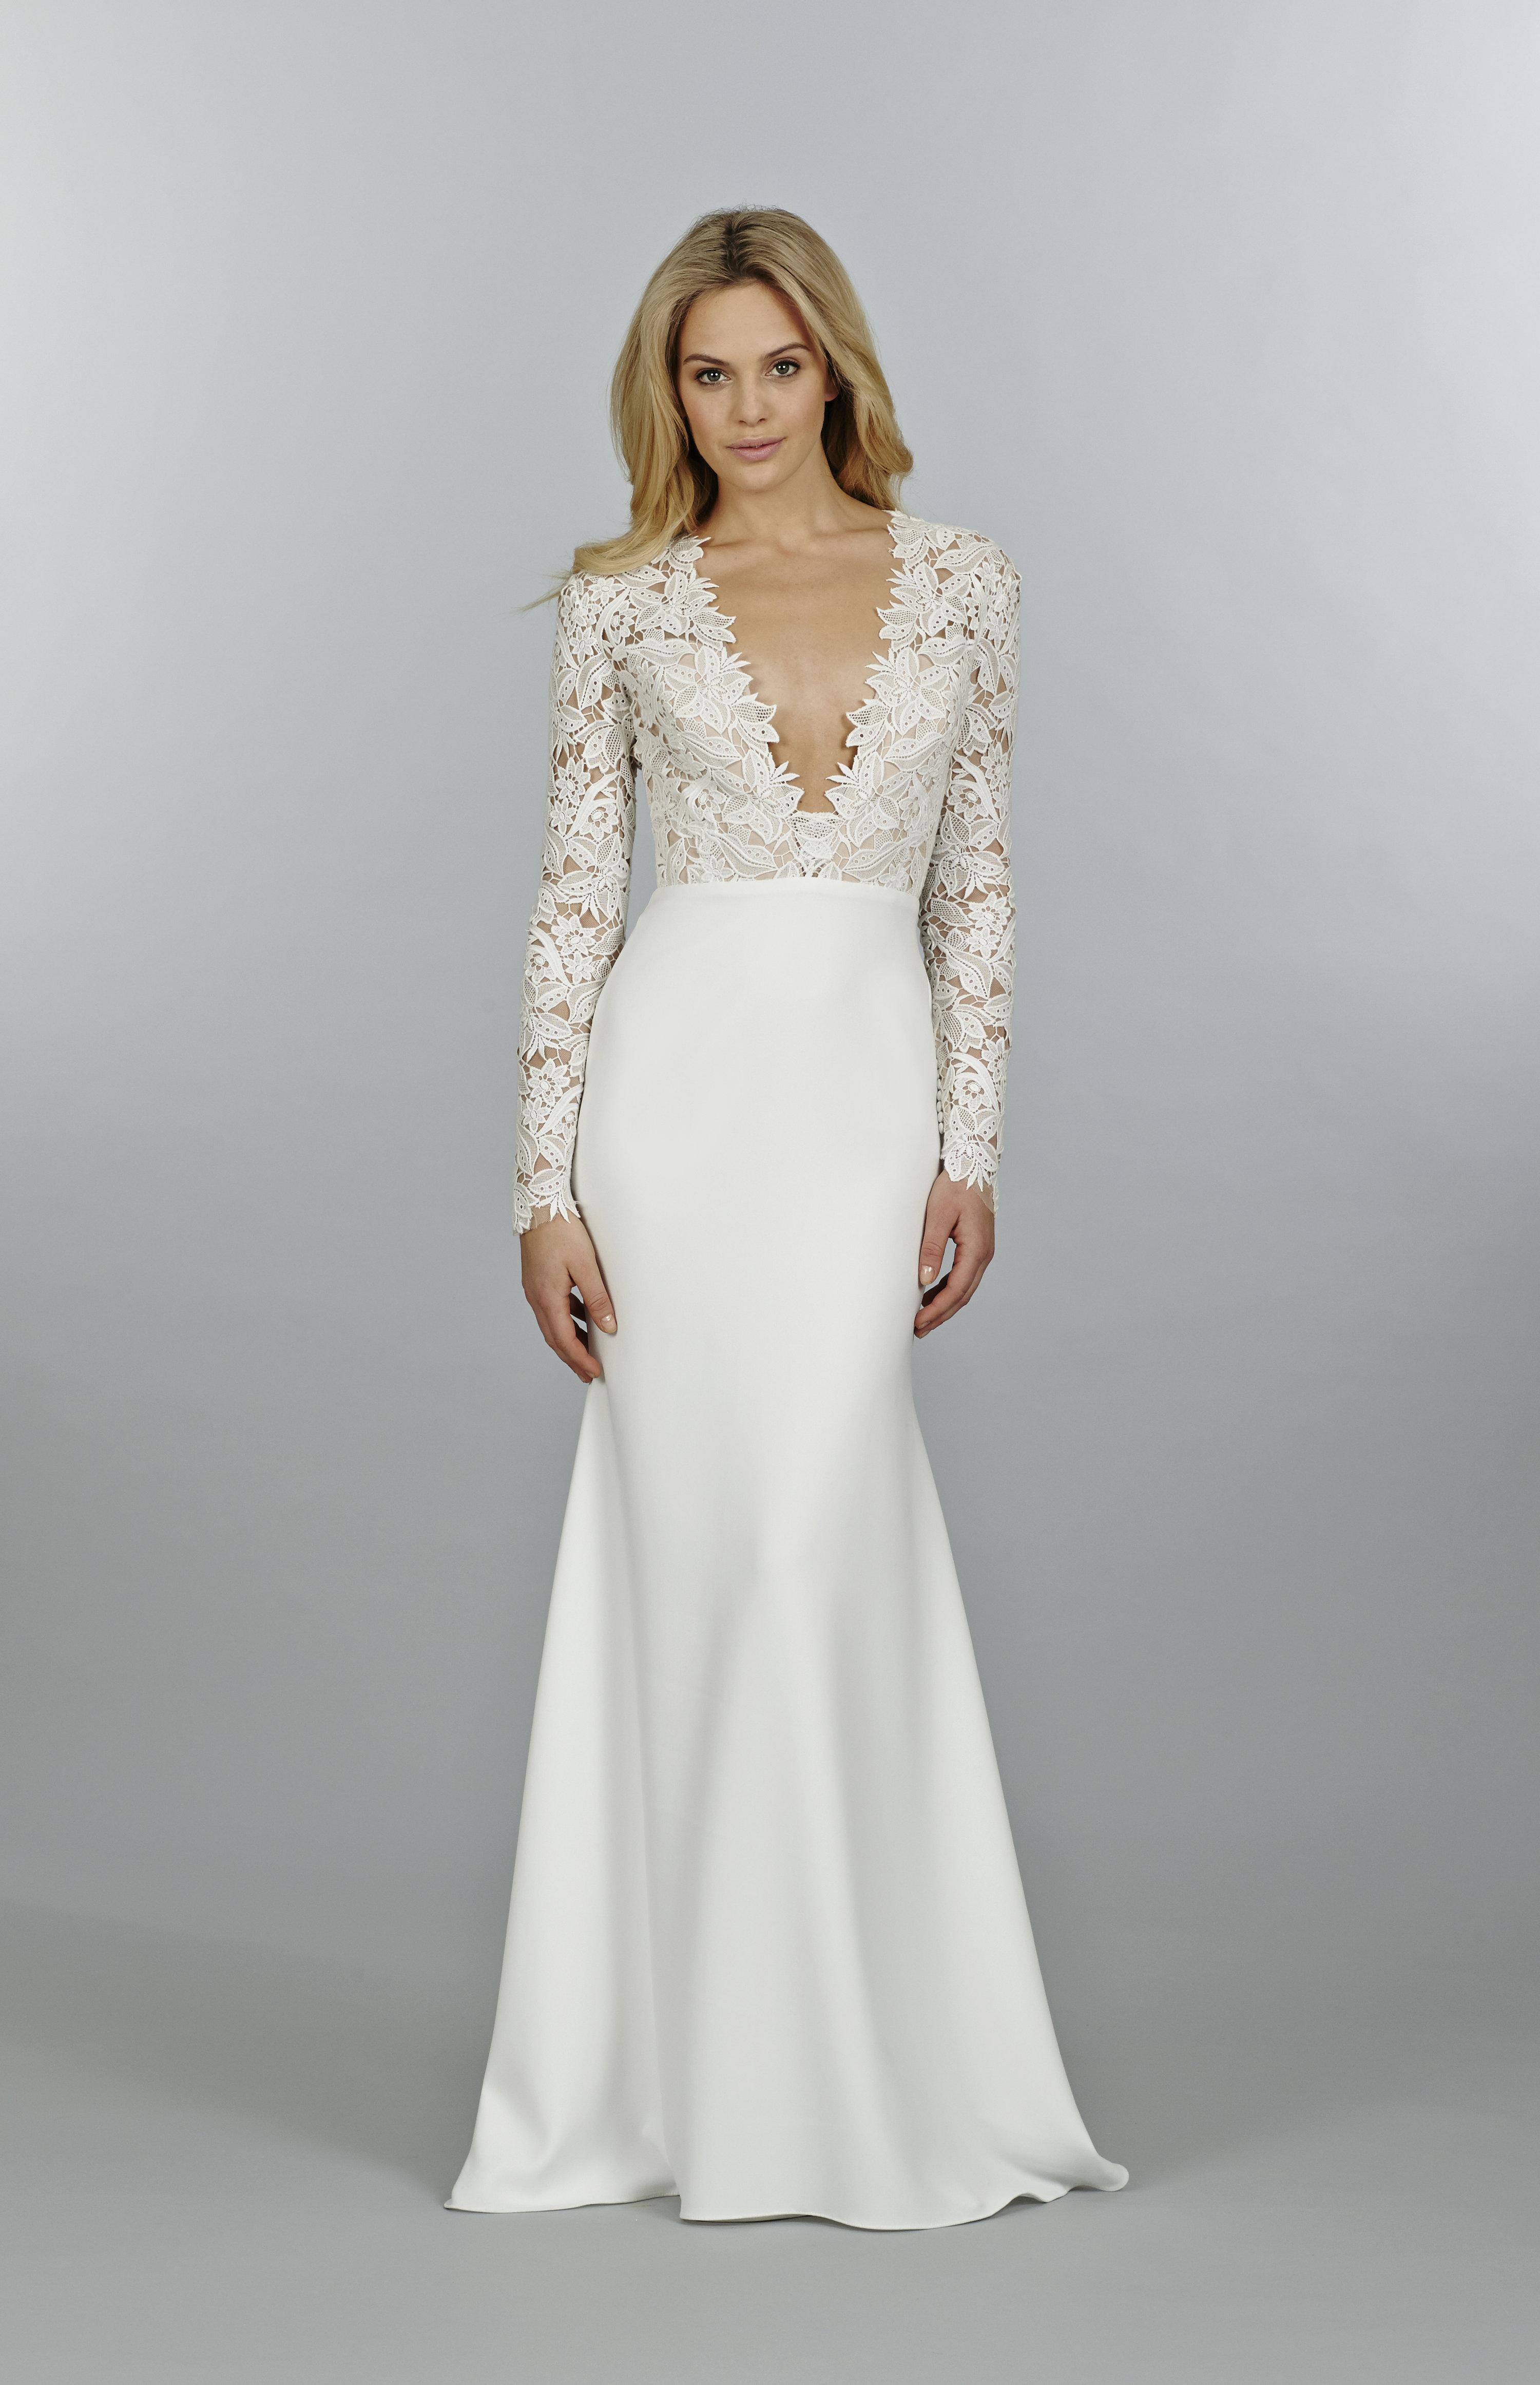 Lace long sleeve bridesmaid dress